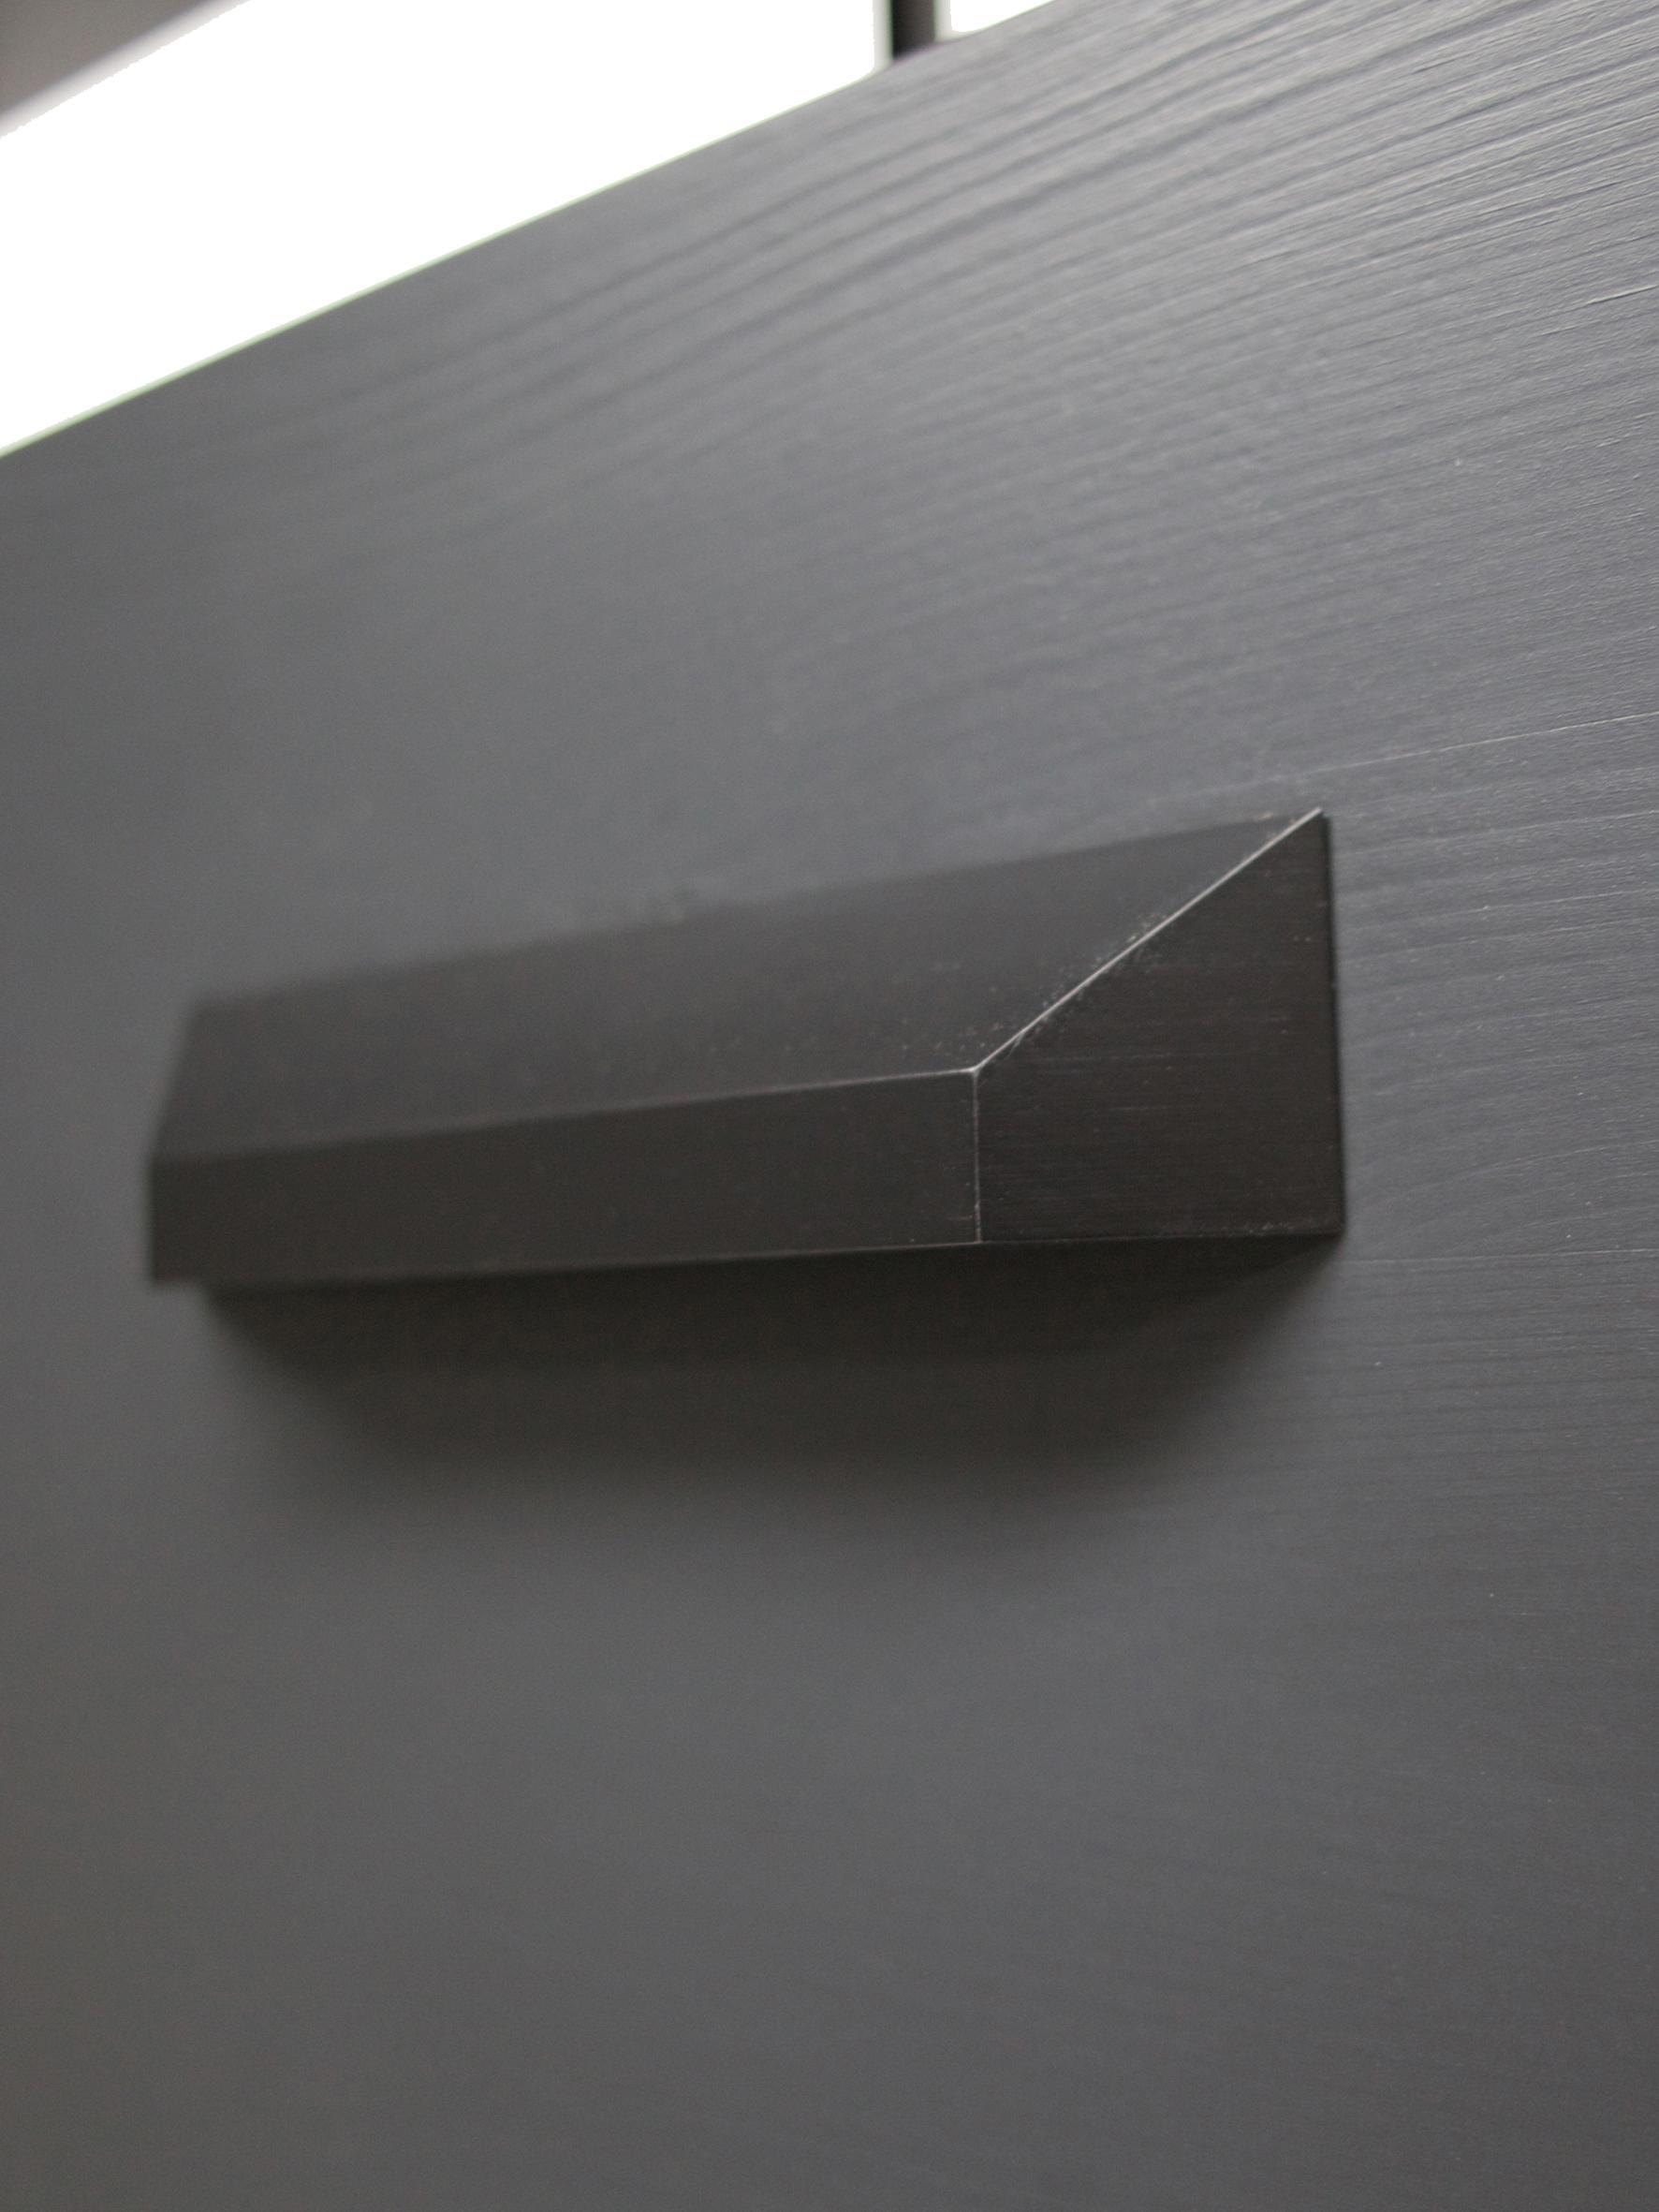 Standregal Legacy aus Metall, Rahmen: Stahl, lackiert, Schwarz, 123 x 220 cm